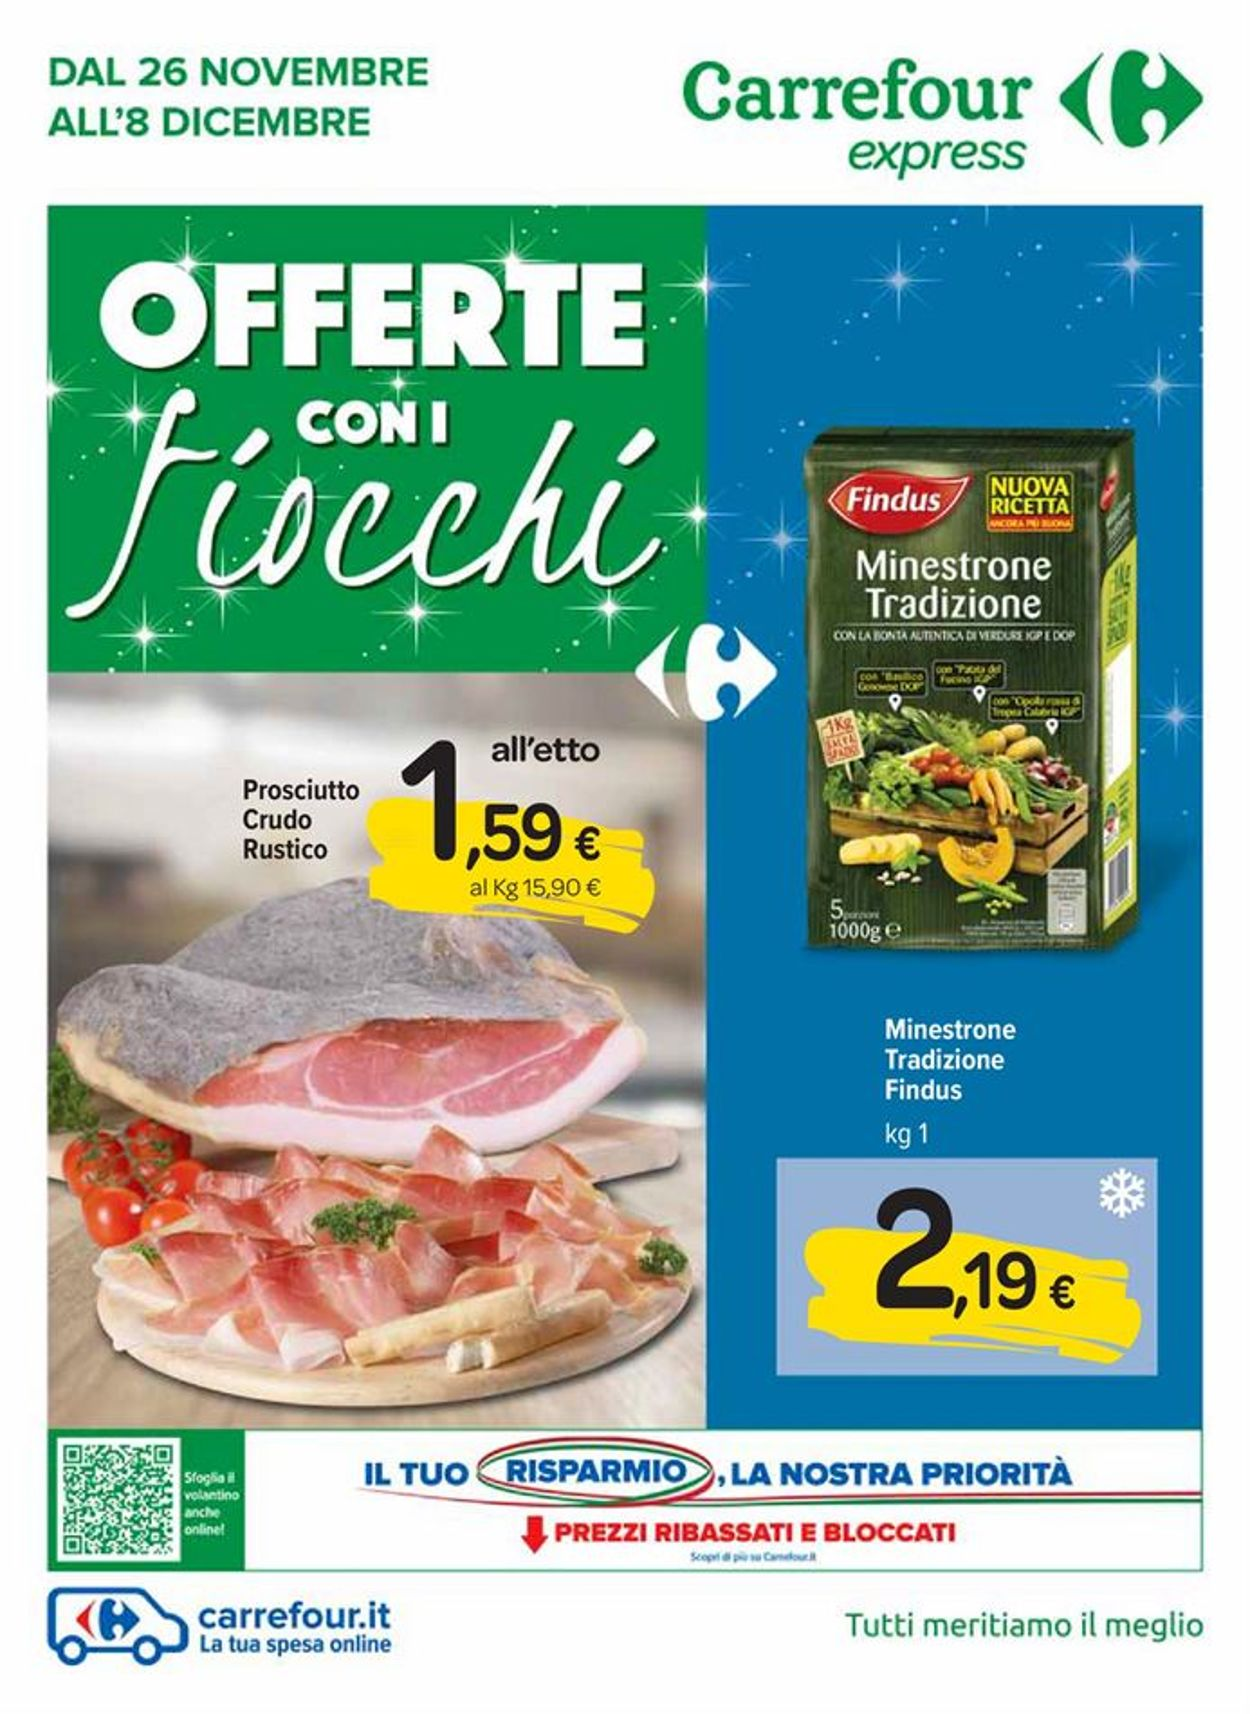 Volantino Carrefour - Natale 2020 - Offerte 26/11-08/12/2020